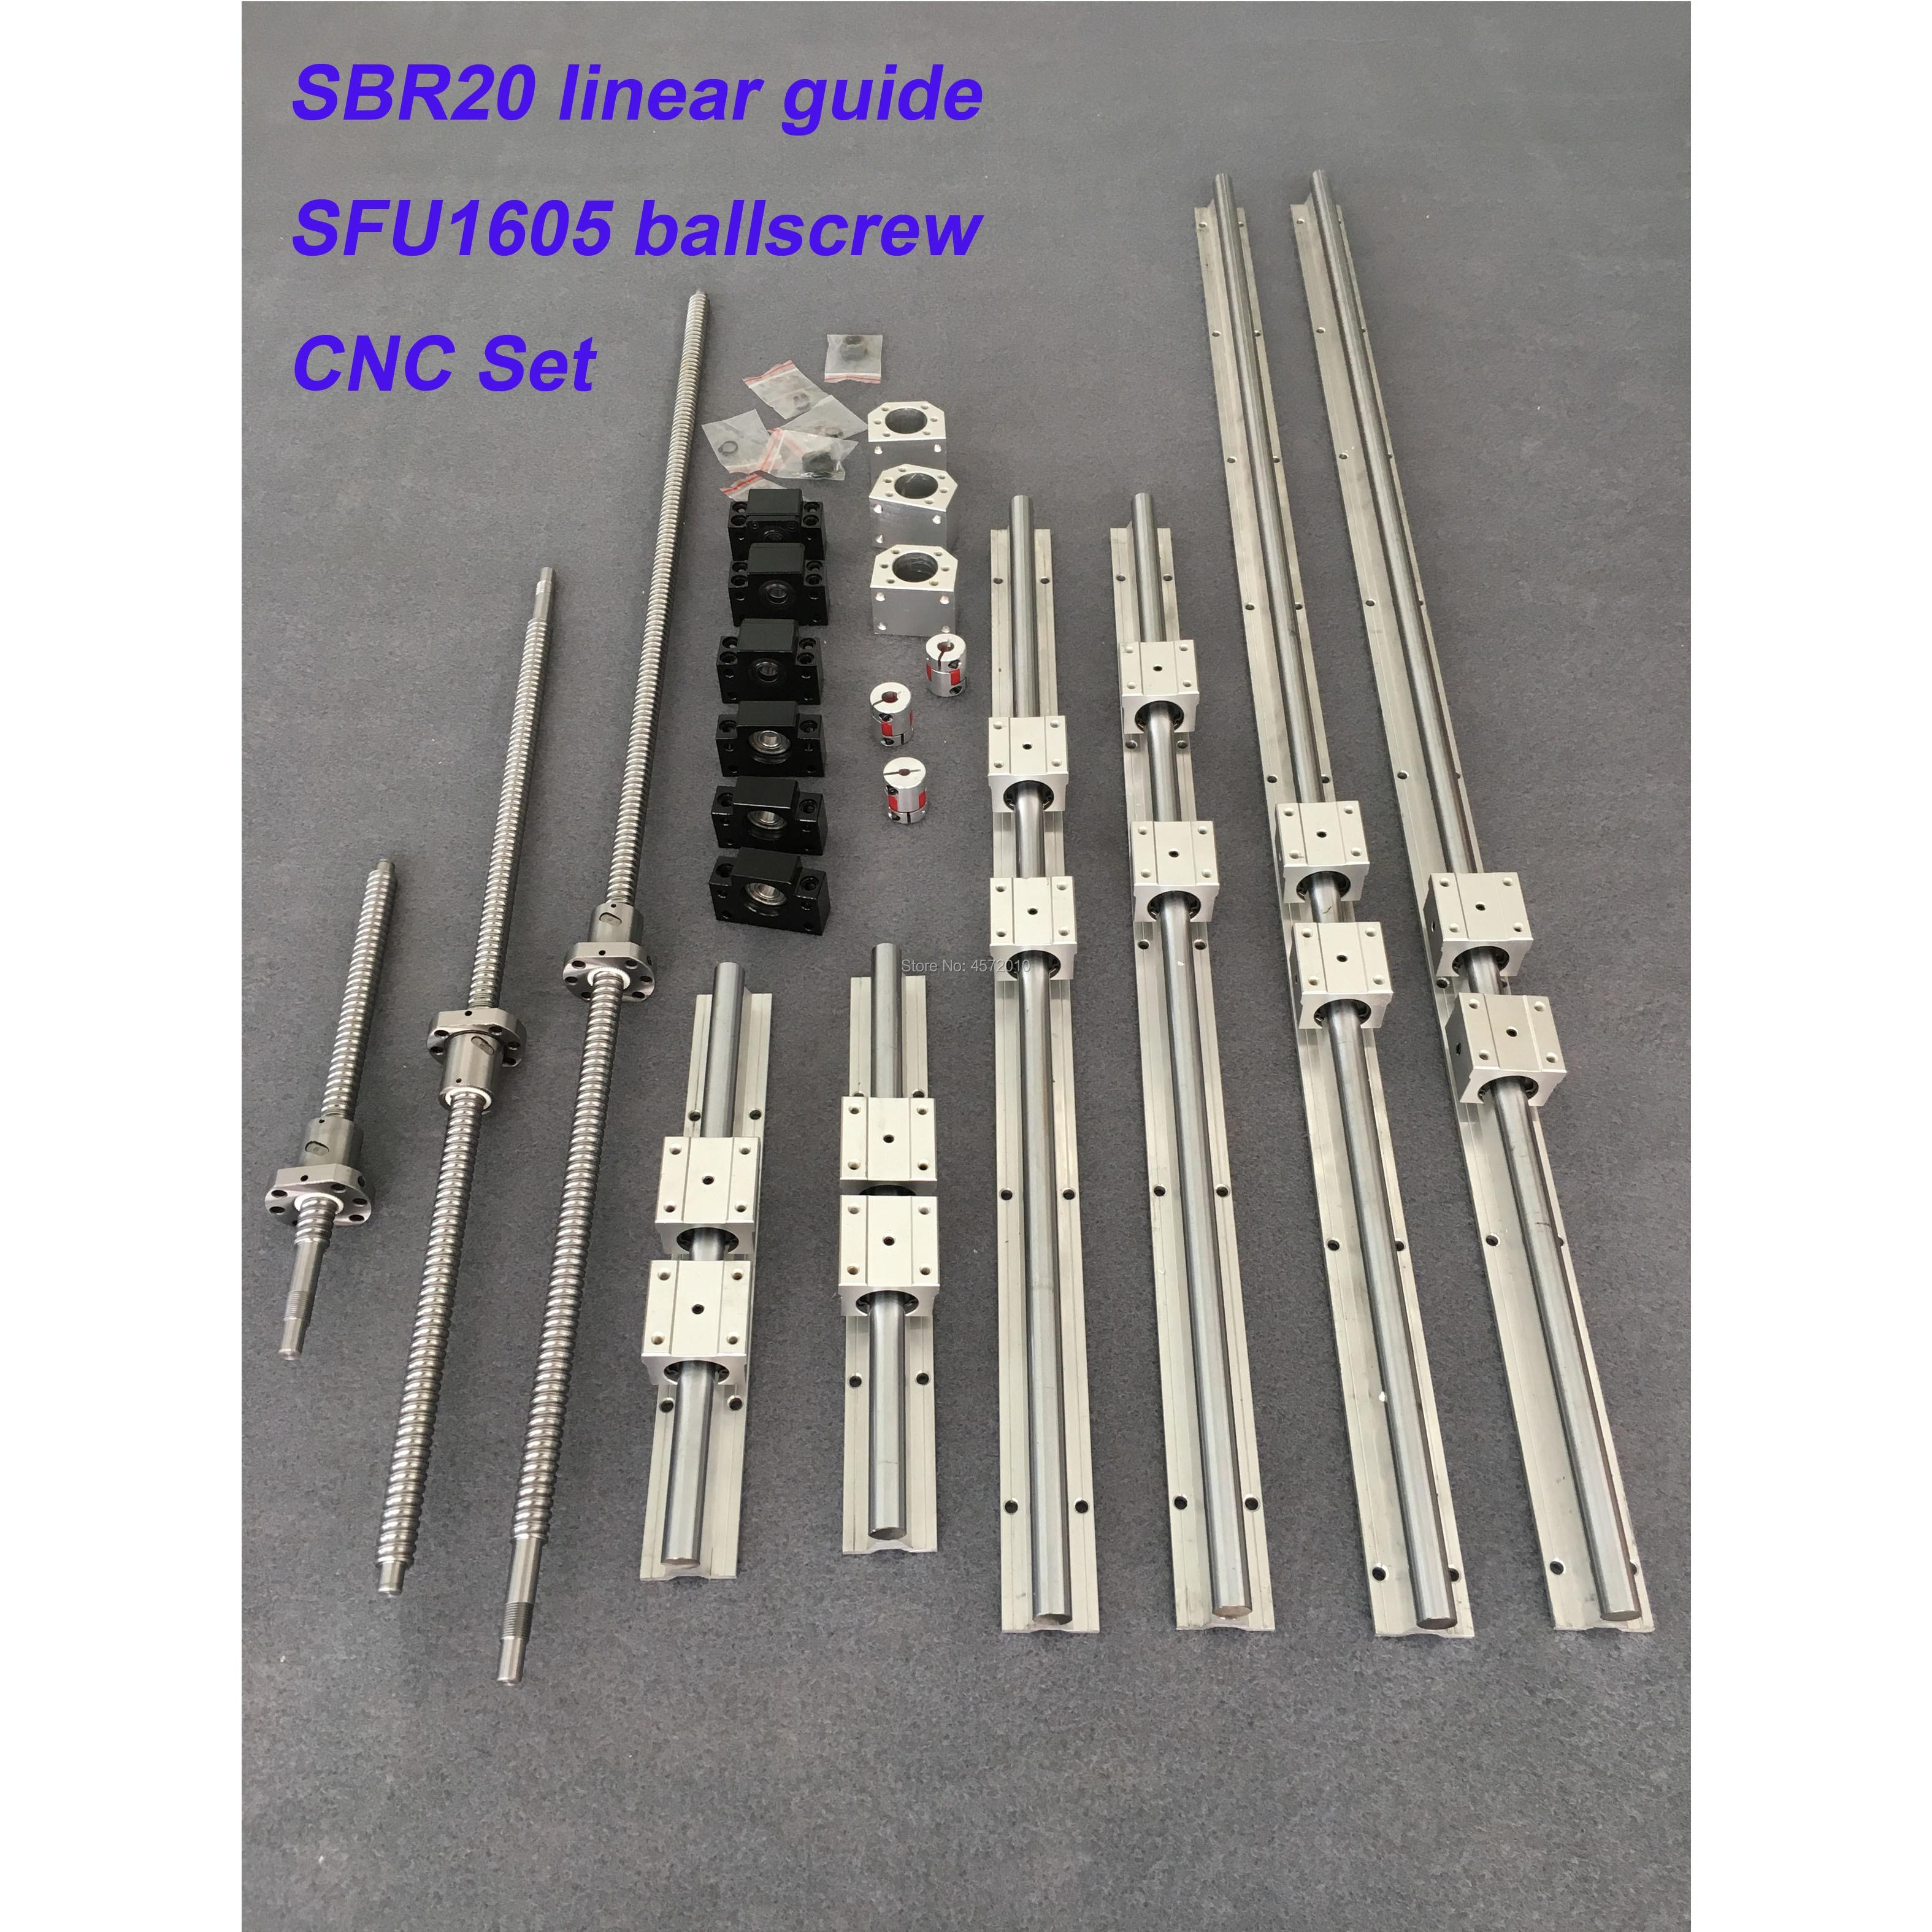 6 sets SBR20 linear guide rail SBR20 - 400/1500/1500mm + SFU1605 - 450/1550/1550mm ballscrew + BK12 BF12 + Nut housing cnc parts